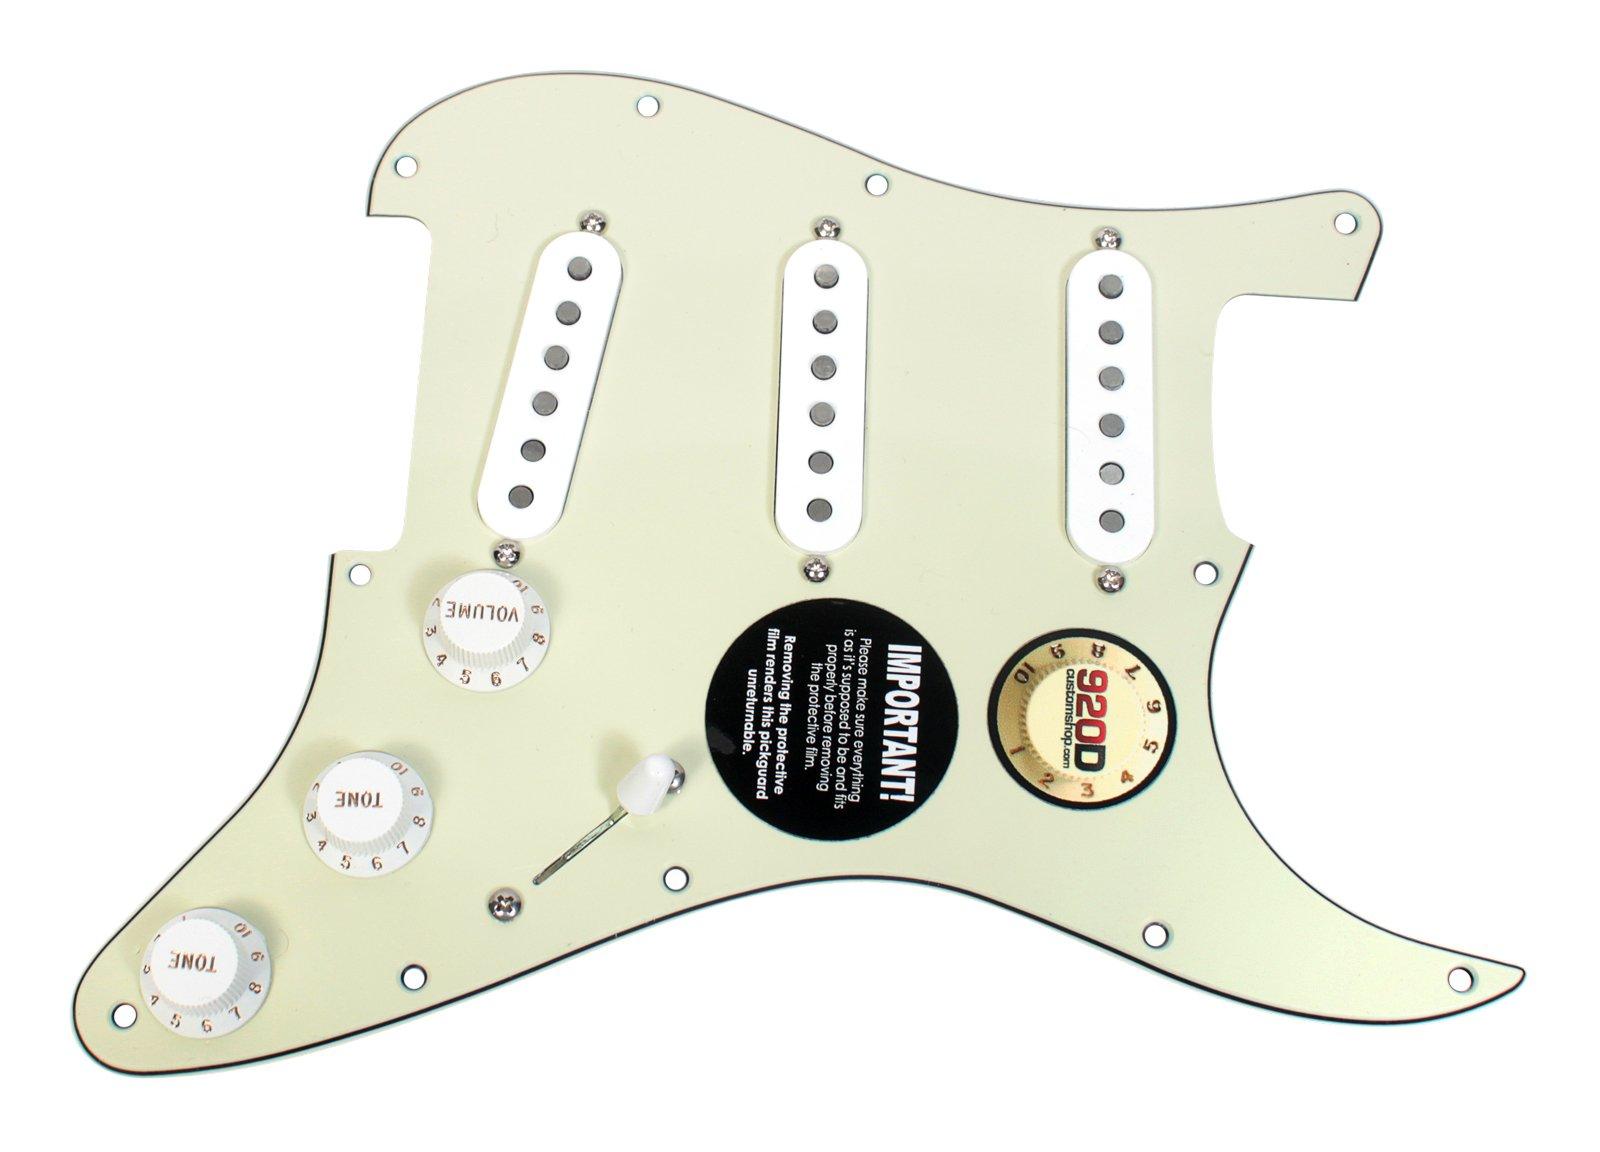 Seymour Duncan SSL-1 Loaded Strat Pickguard Strat Mint Green / White